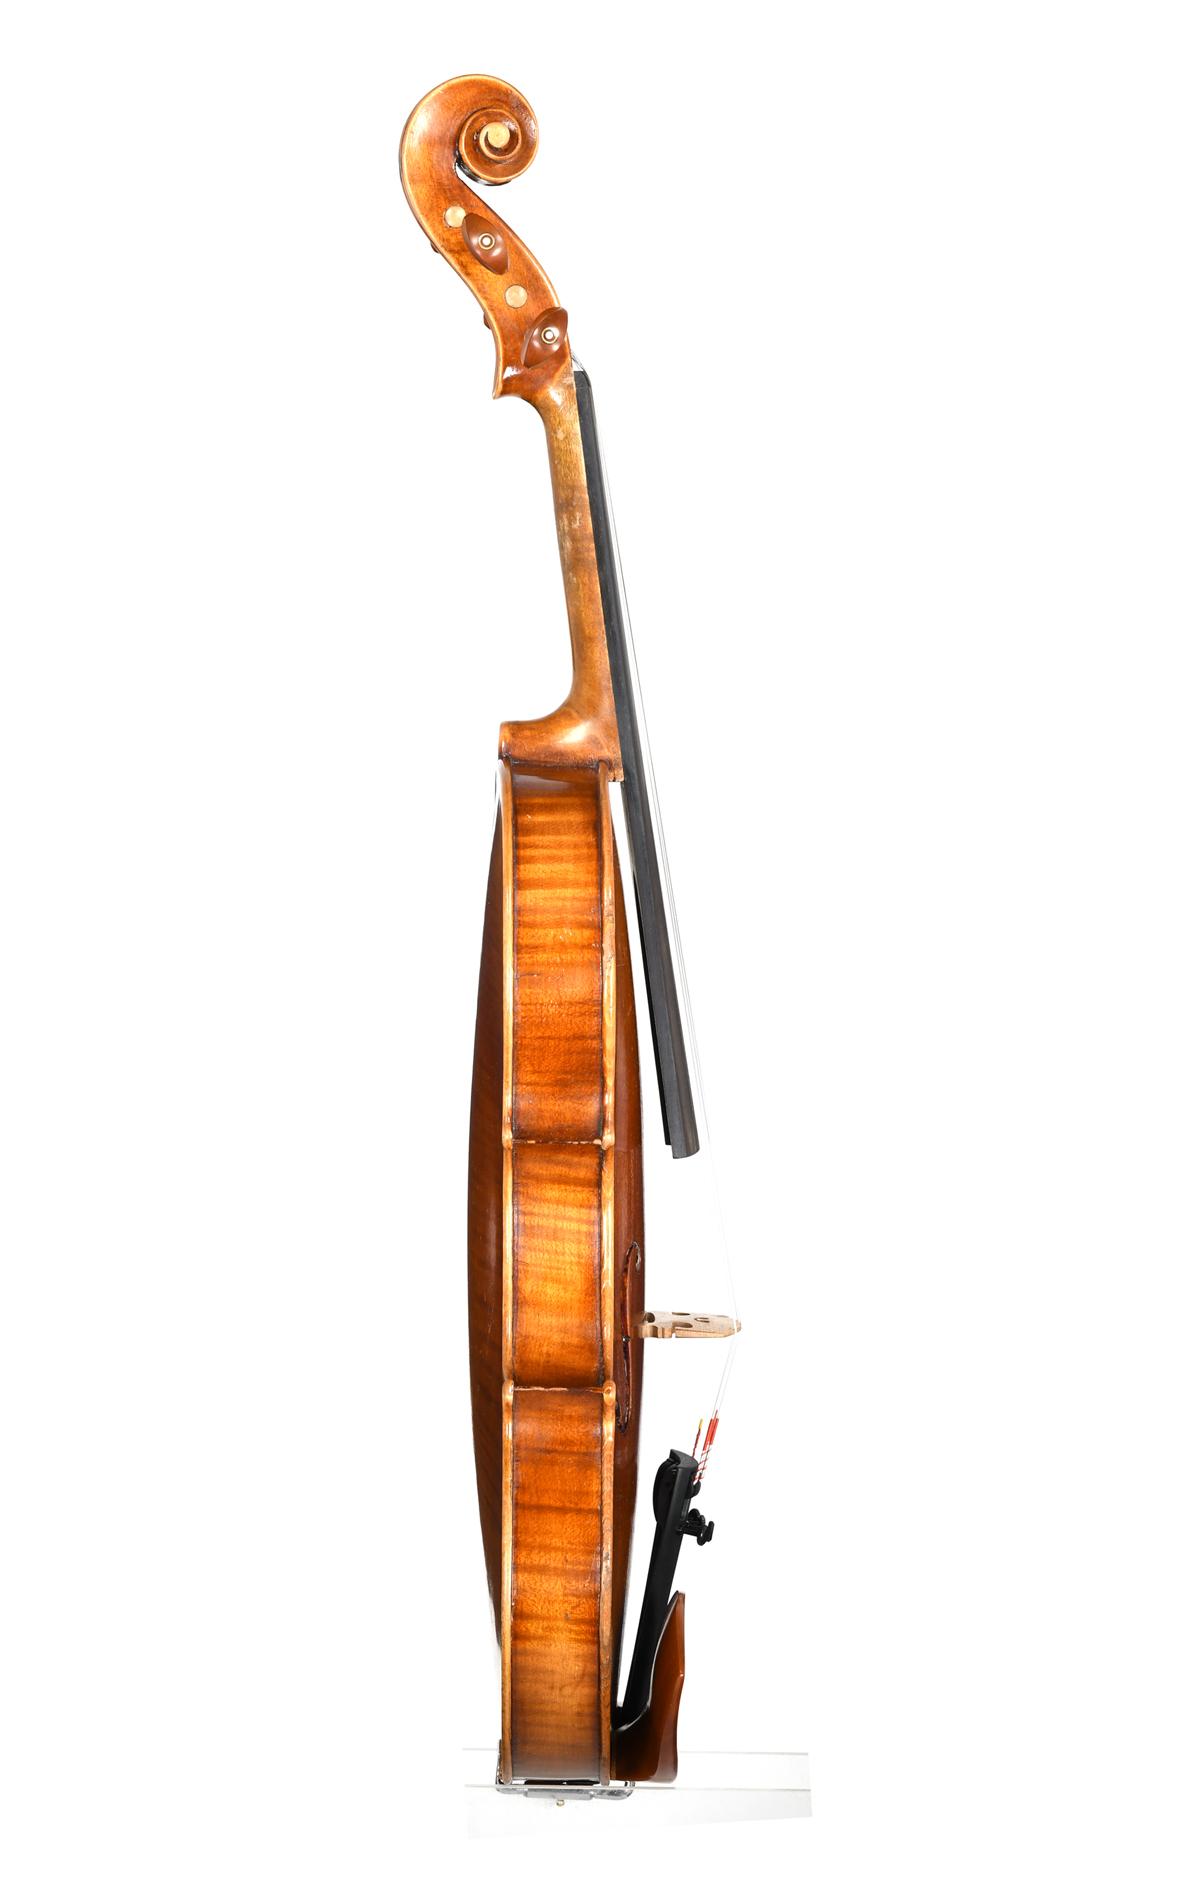 3 4 violin by e l g tter markneukirchen approx 1920 children 39 s violins markneukirchen. Black Bedroom Furniture Sets. Home Design Ideas